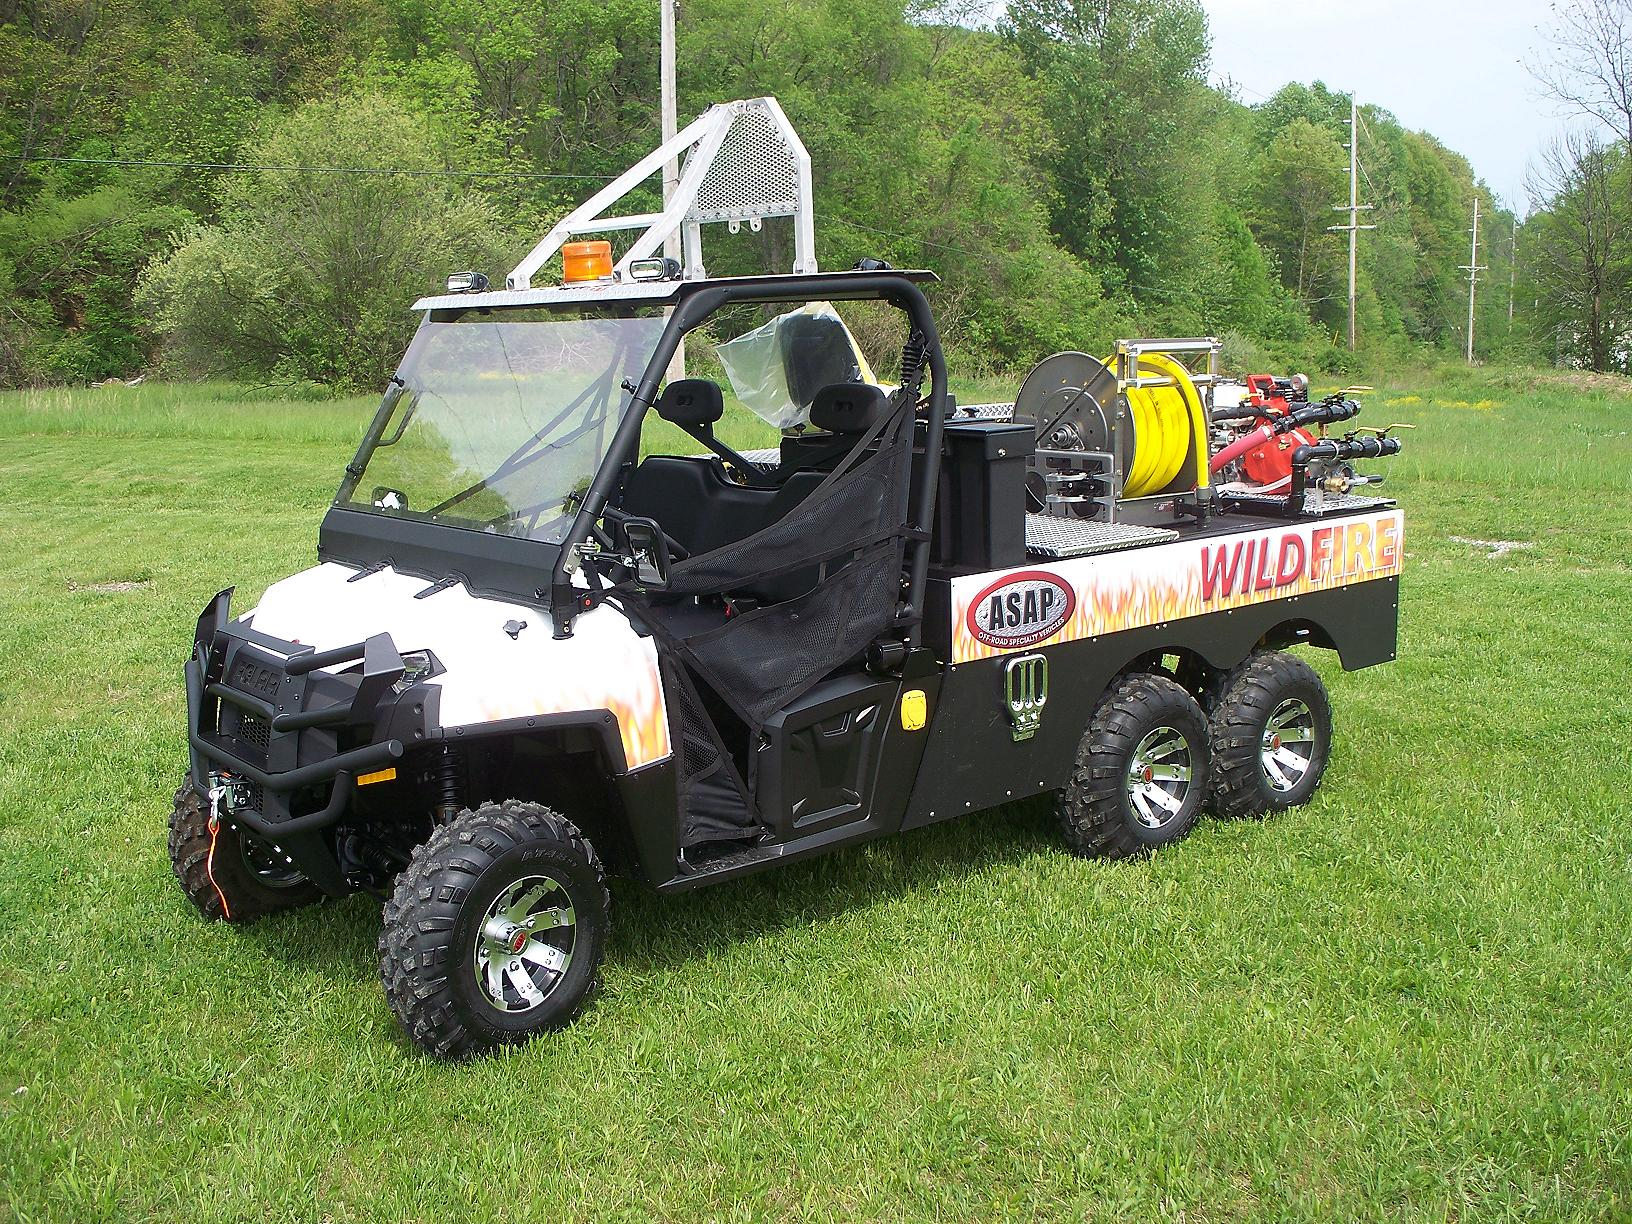 New Deliveries Asap911 All Terrain Utv Emergency Vehicles